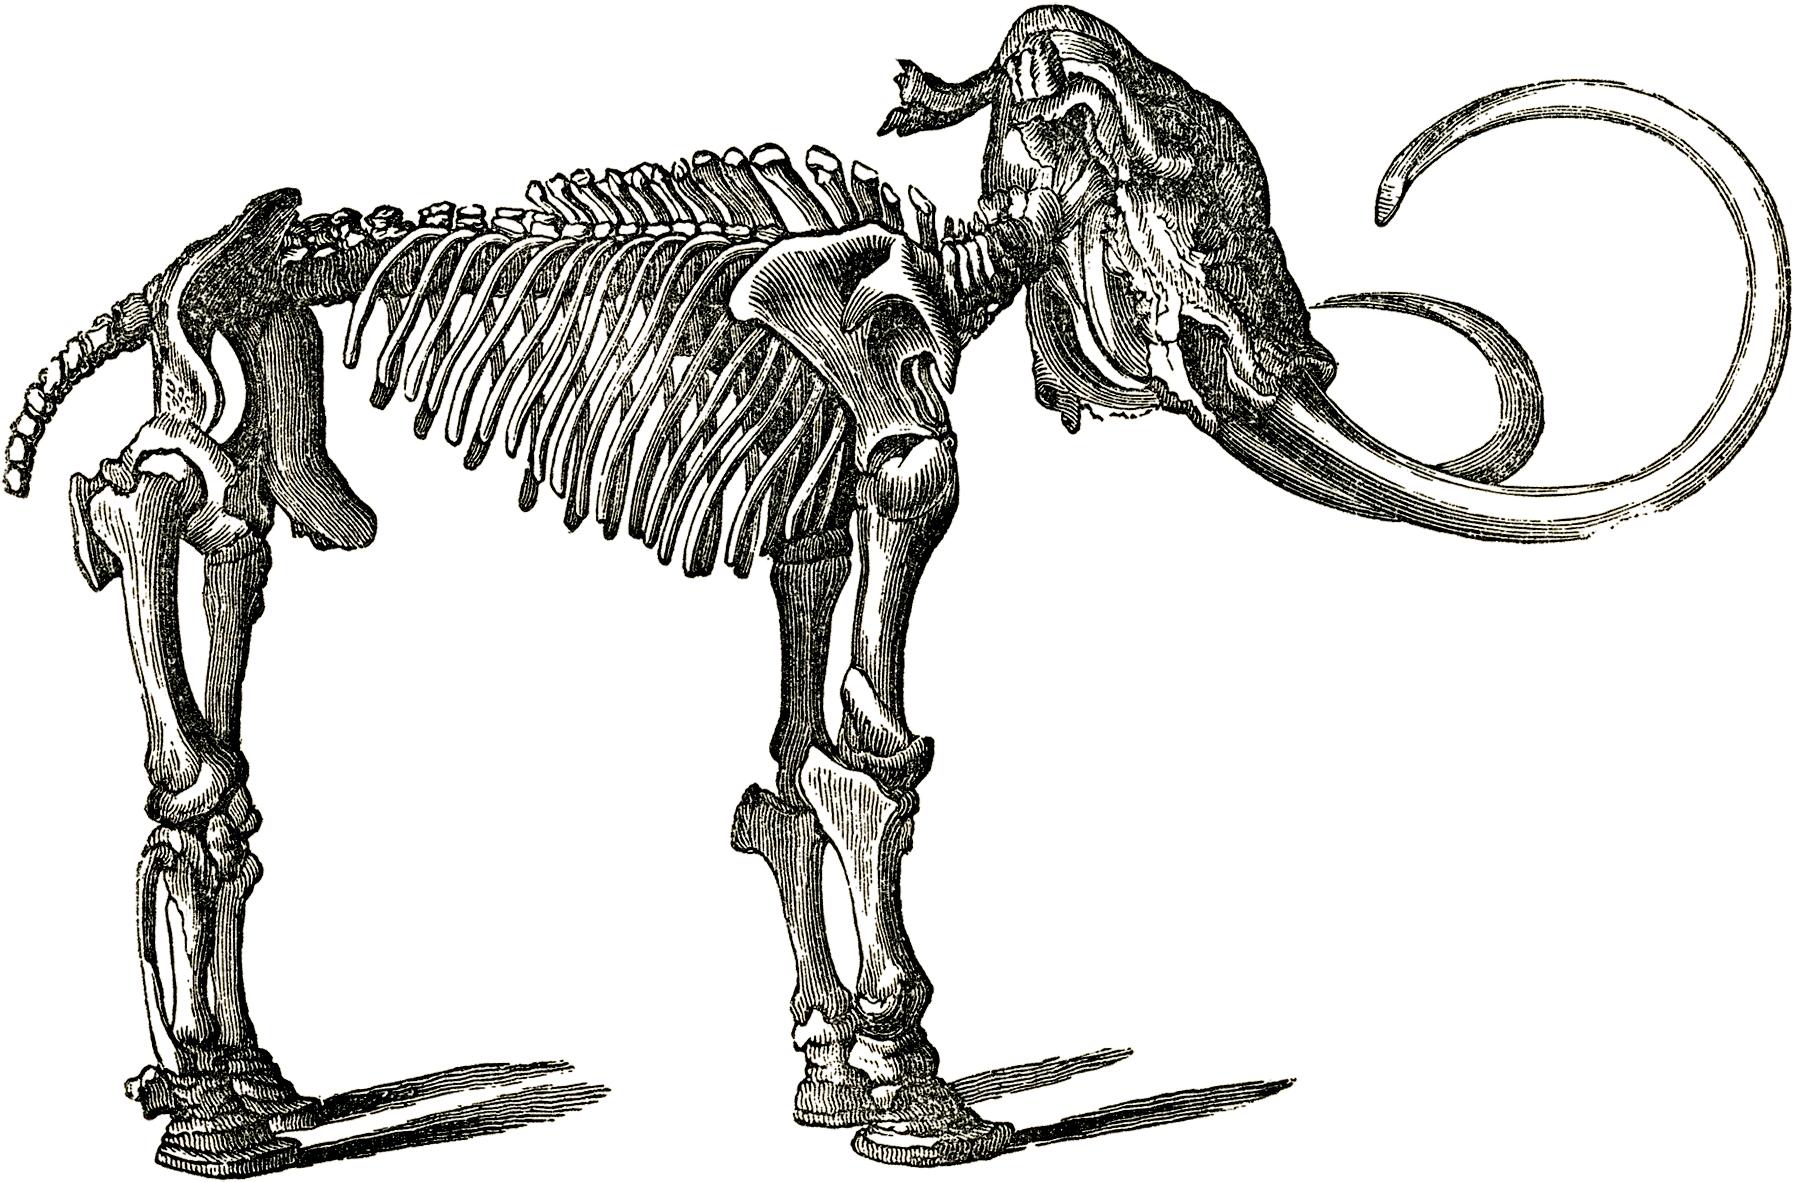 Animal skeleton clipart vector royalty free stock Free Bones Skeleton Cliparts, Download Free Clip Art, Free Clip Art ... vector royalty free stock